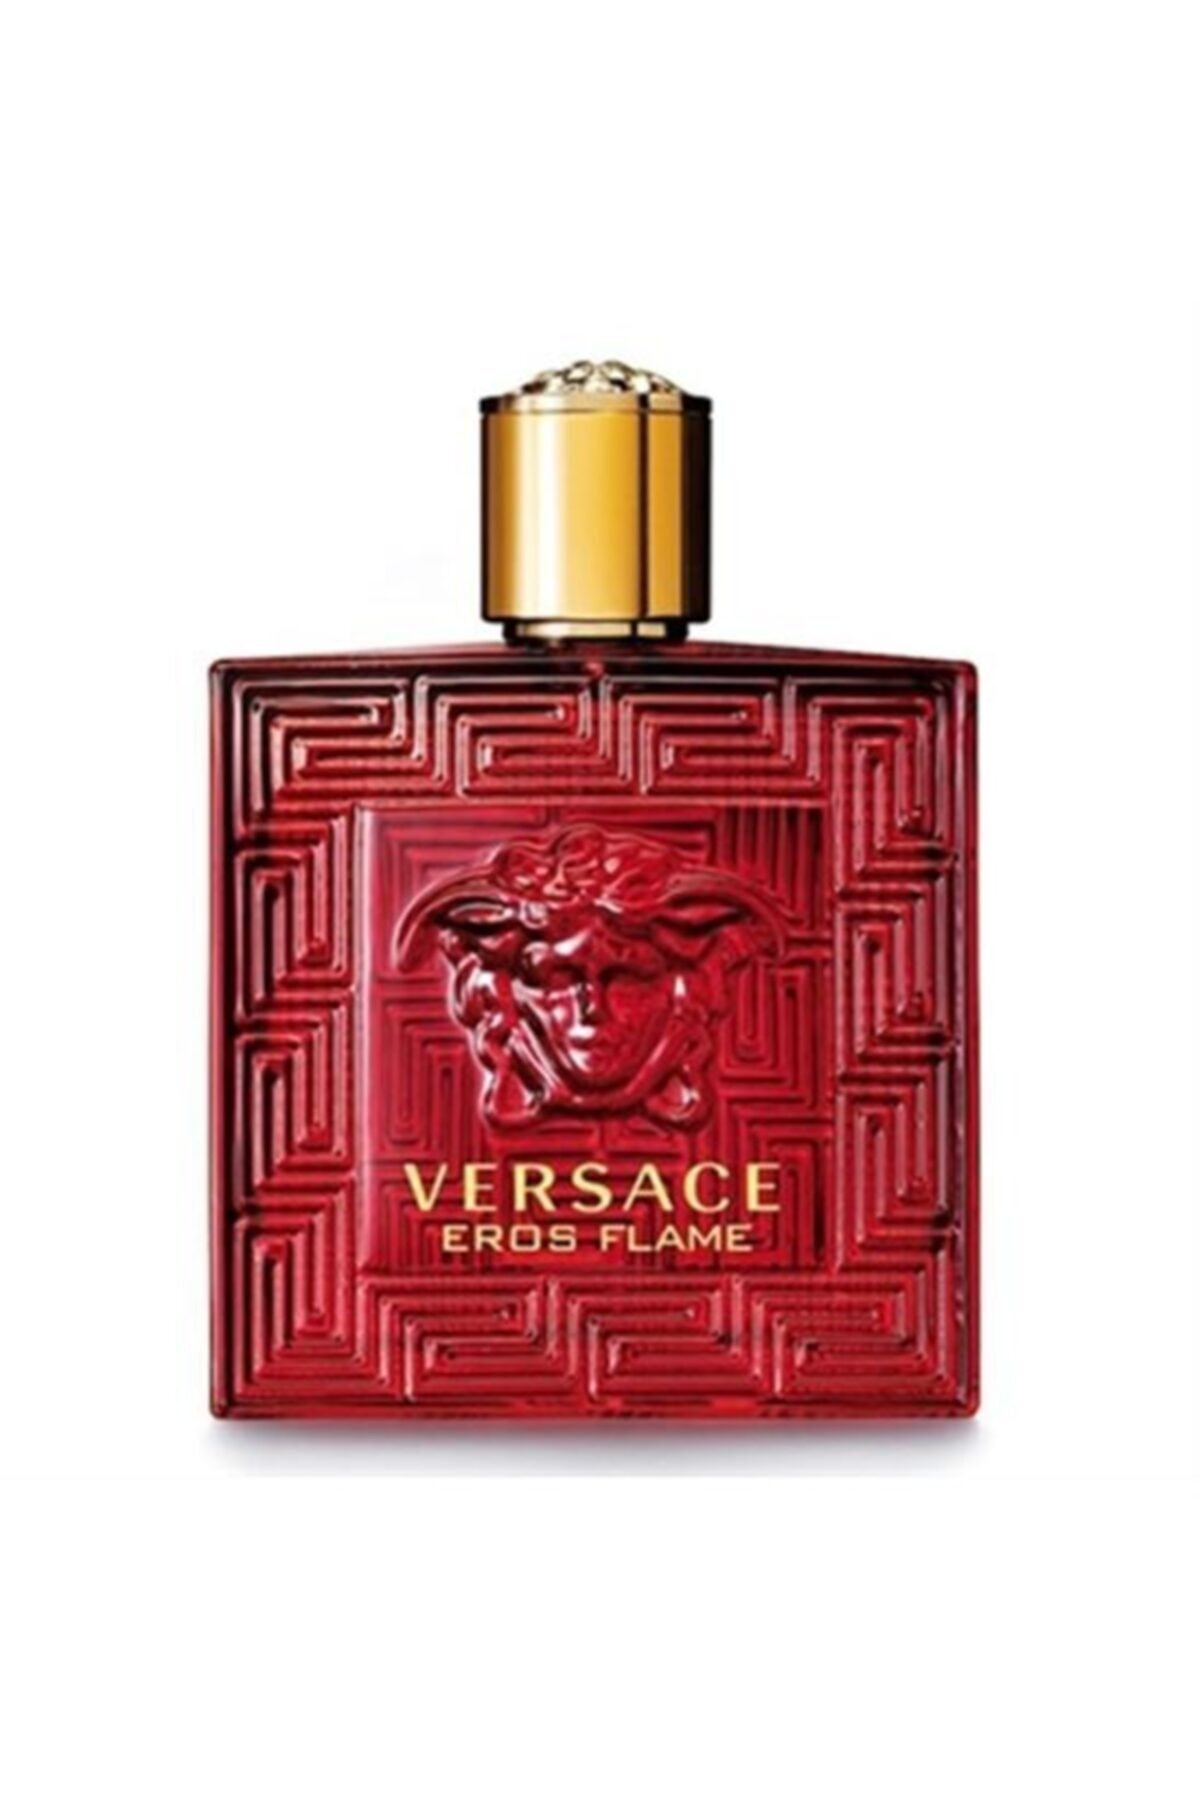 Versace Eros Flame Edp 200 ml Erkek Parfüm 8011003846627 1